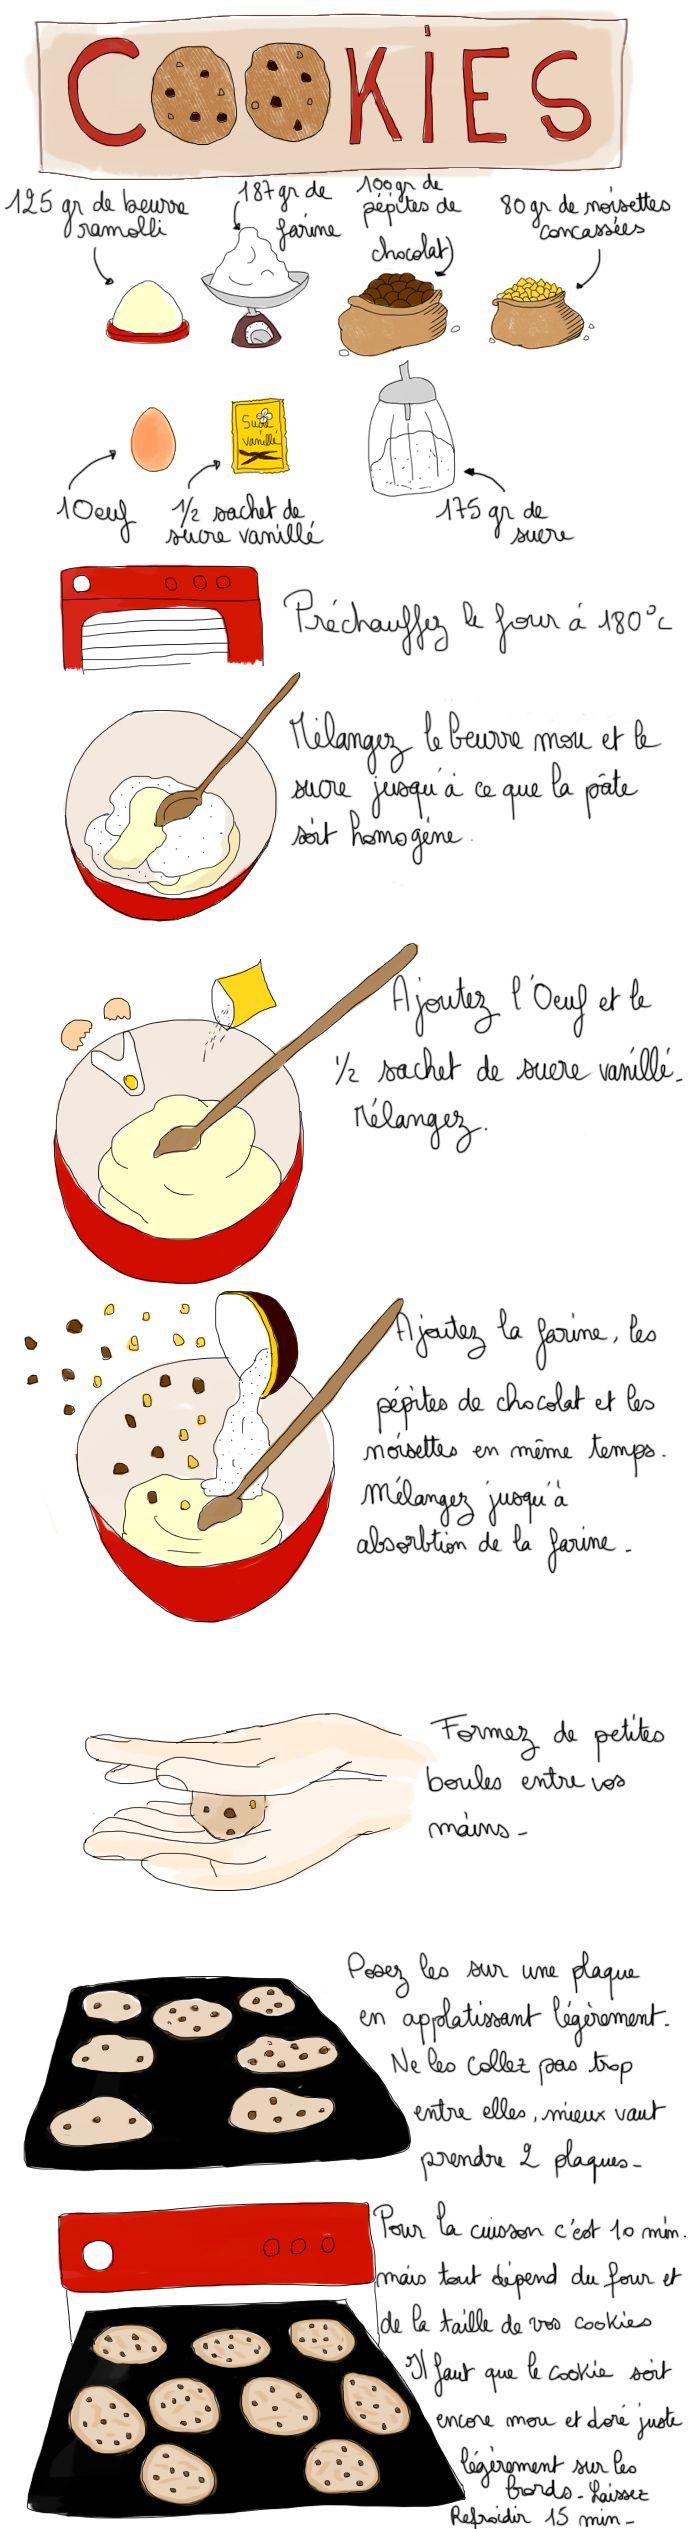 Cookies | Croque moi